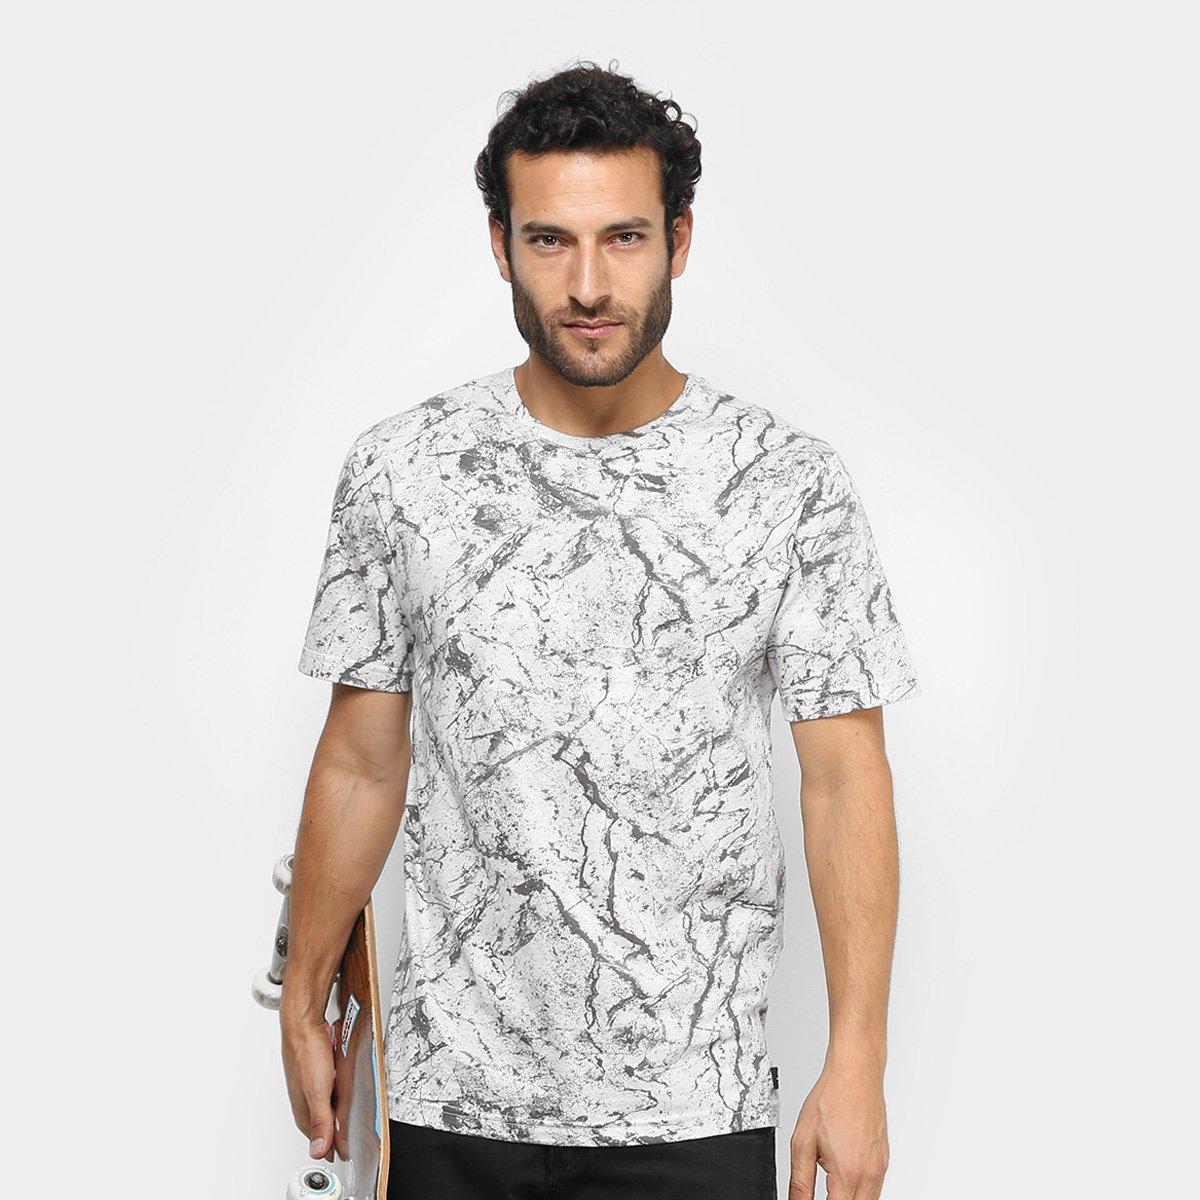 Camiseta Globe Full Print Masculina - Off White - Compre Agora ... b339ec39cd3